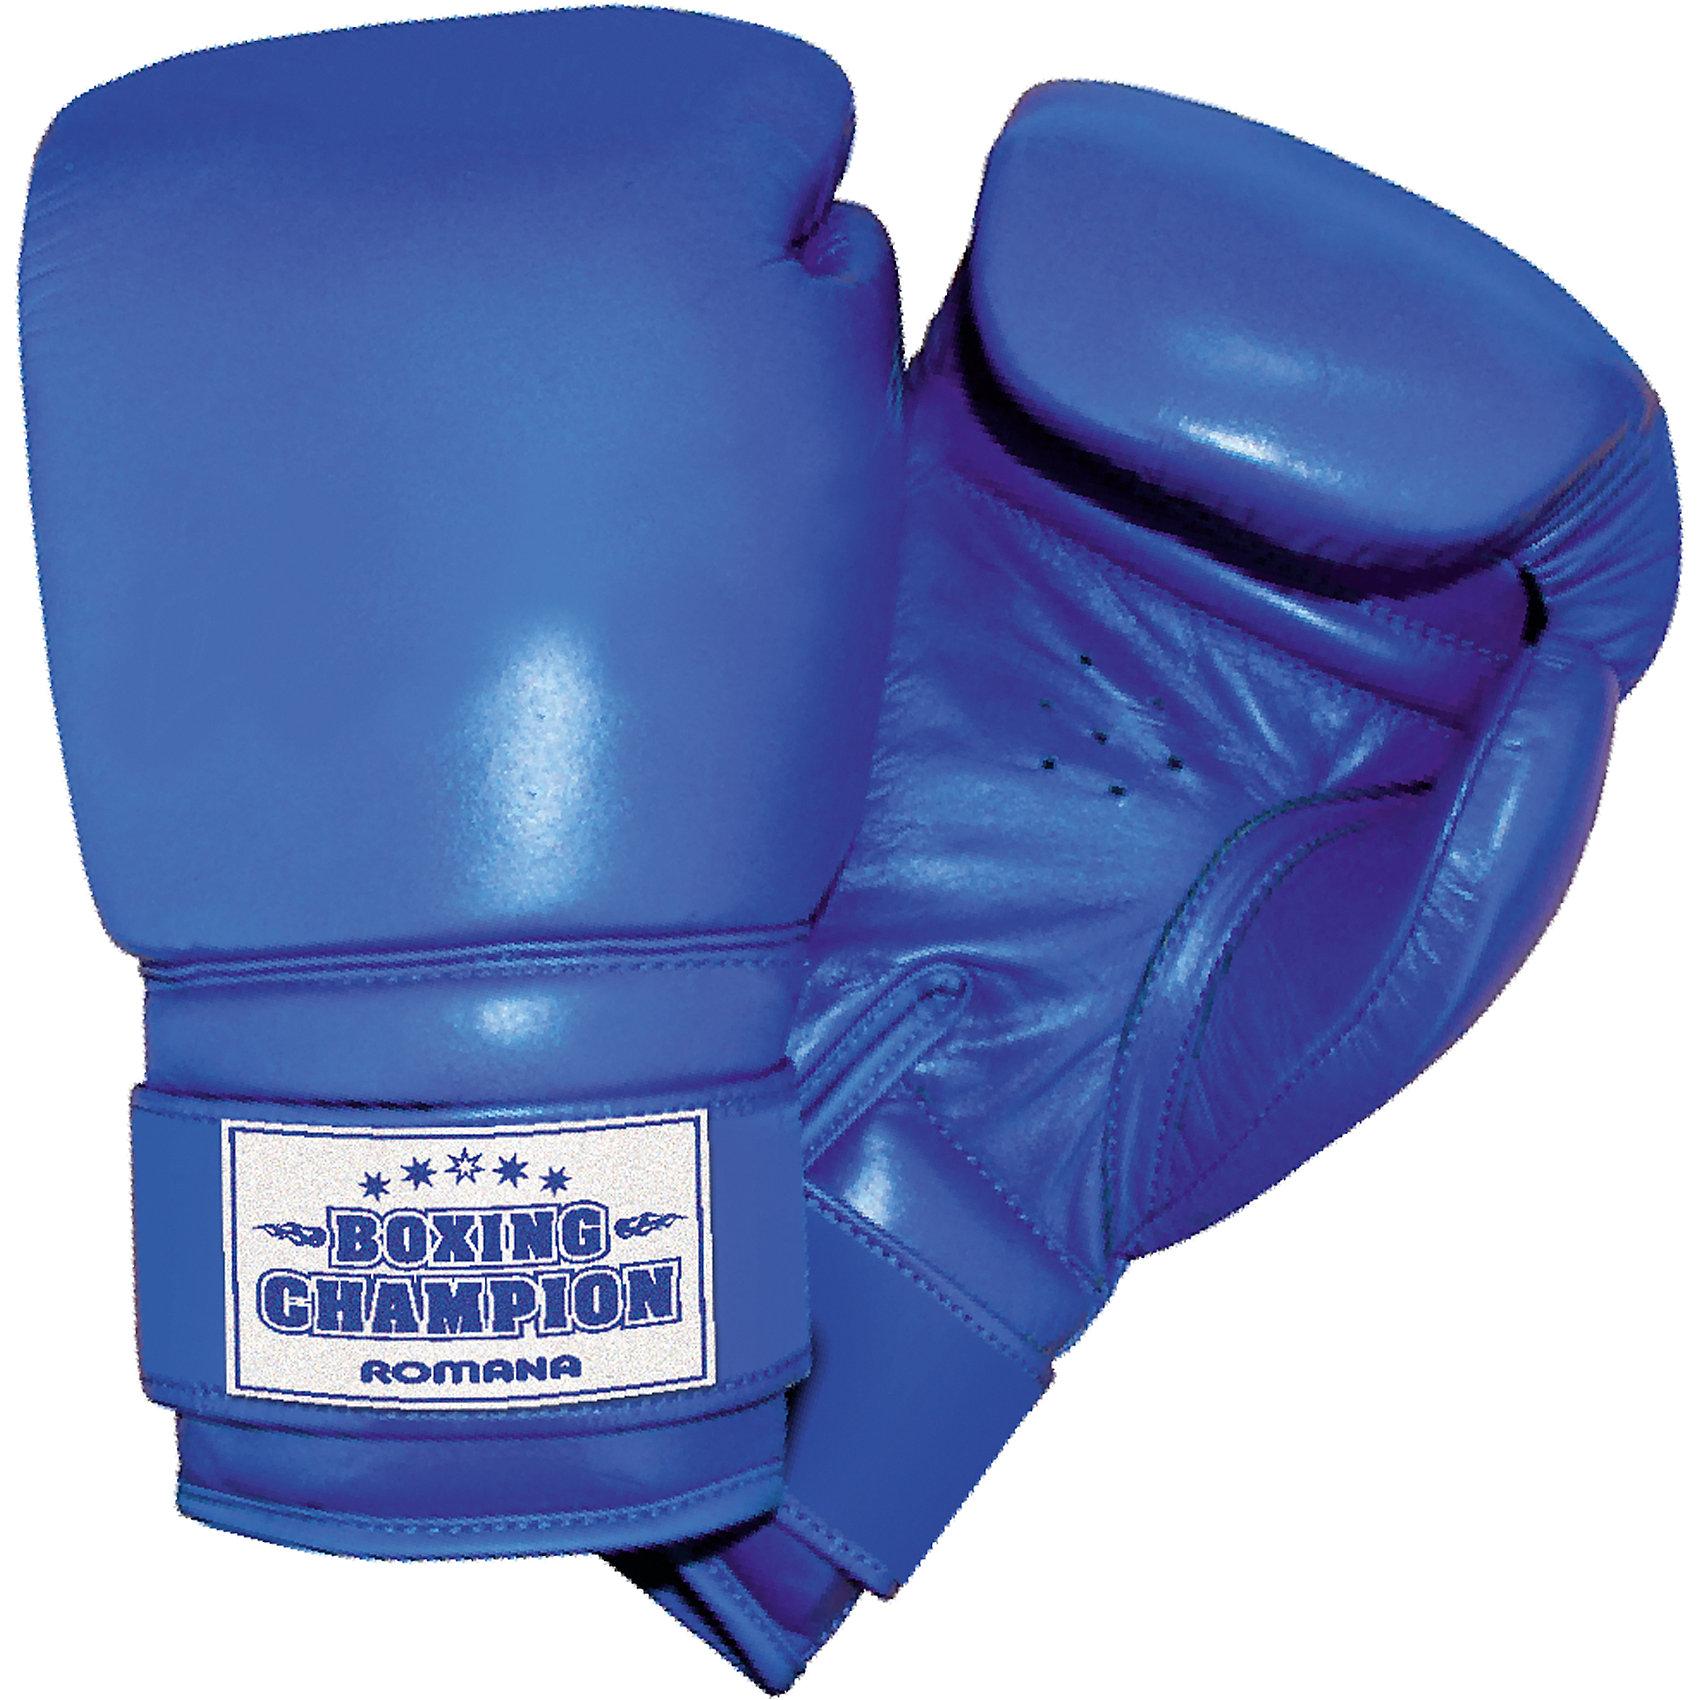 ROMANA Боксерские перчатки для детей 7-10 лет, ROMANA боксерские перчатки в магазинах москвы